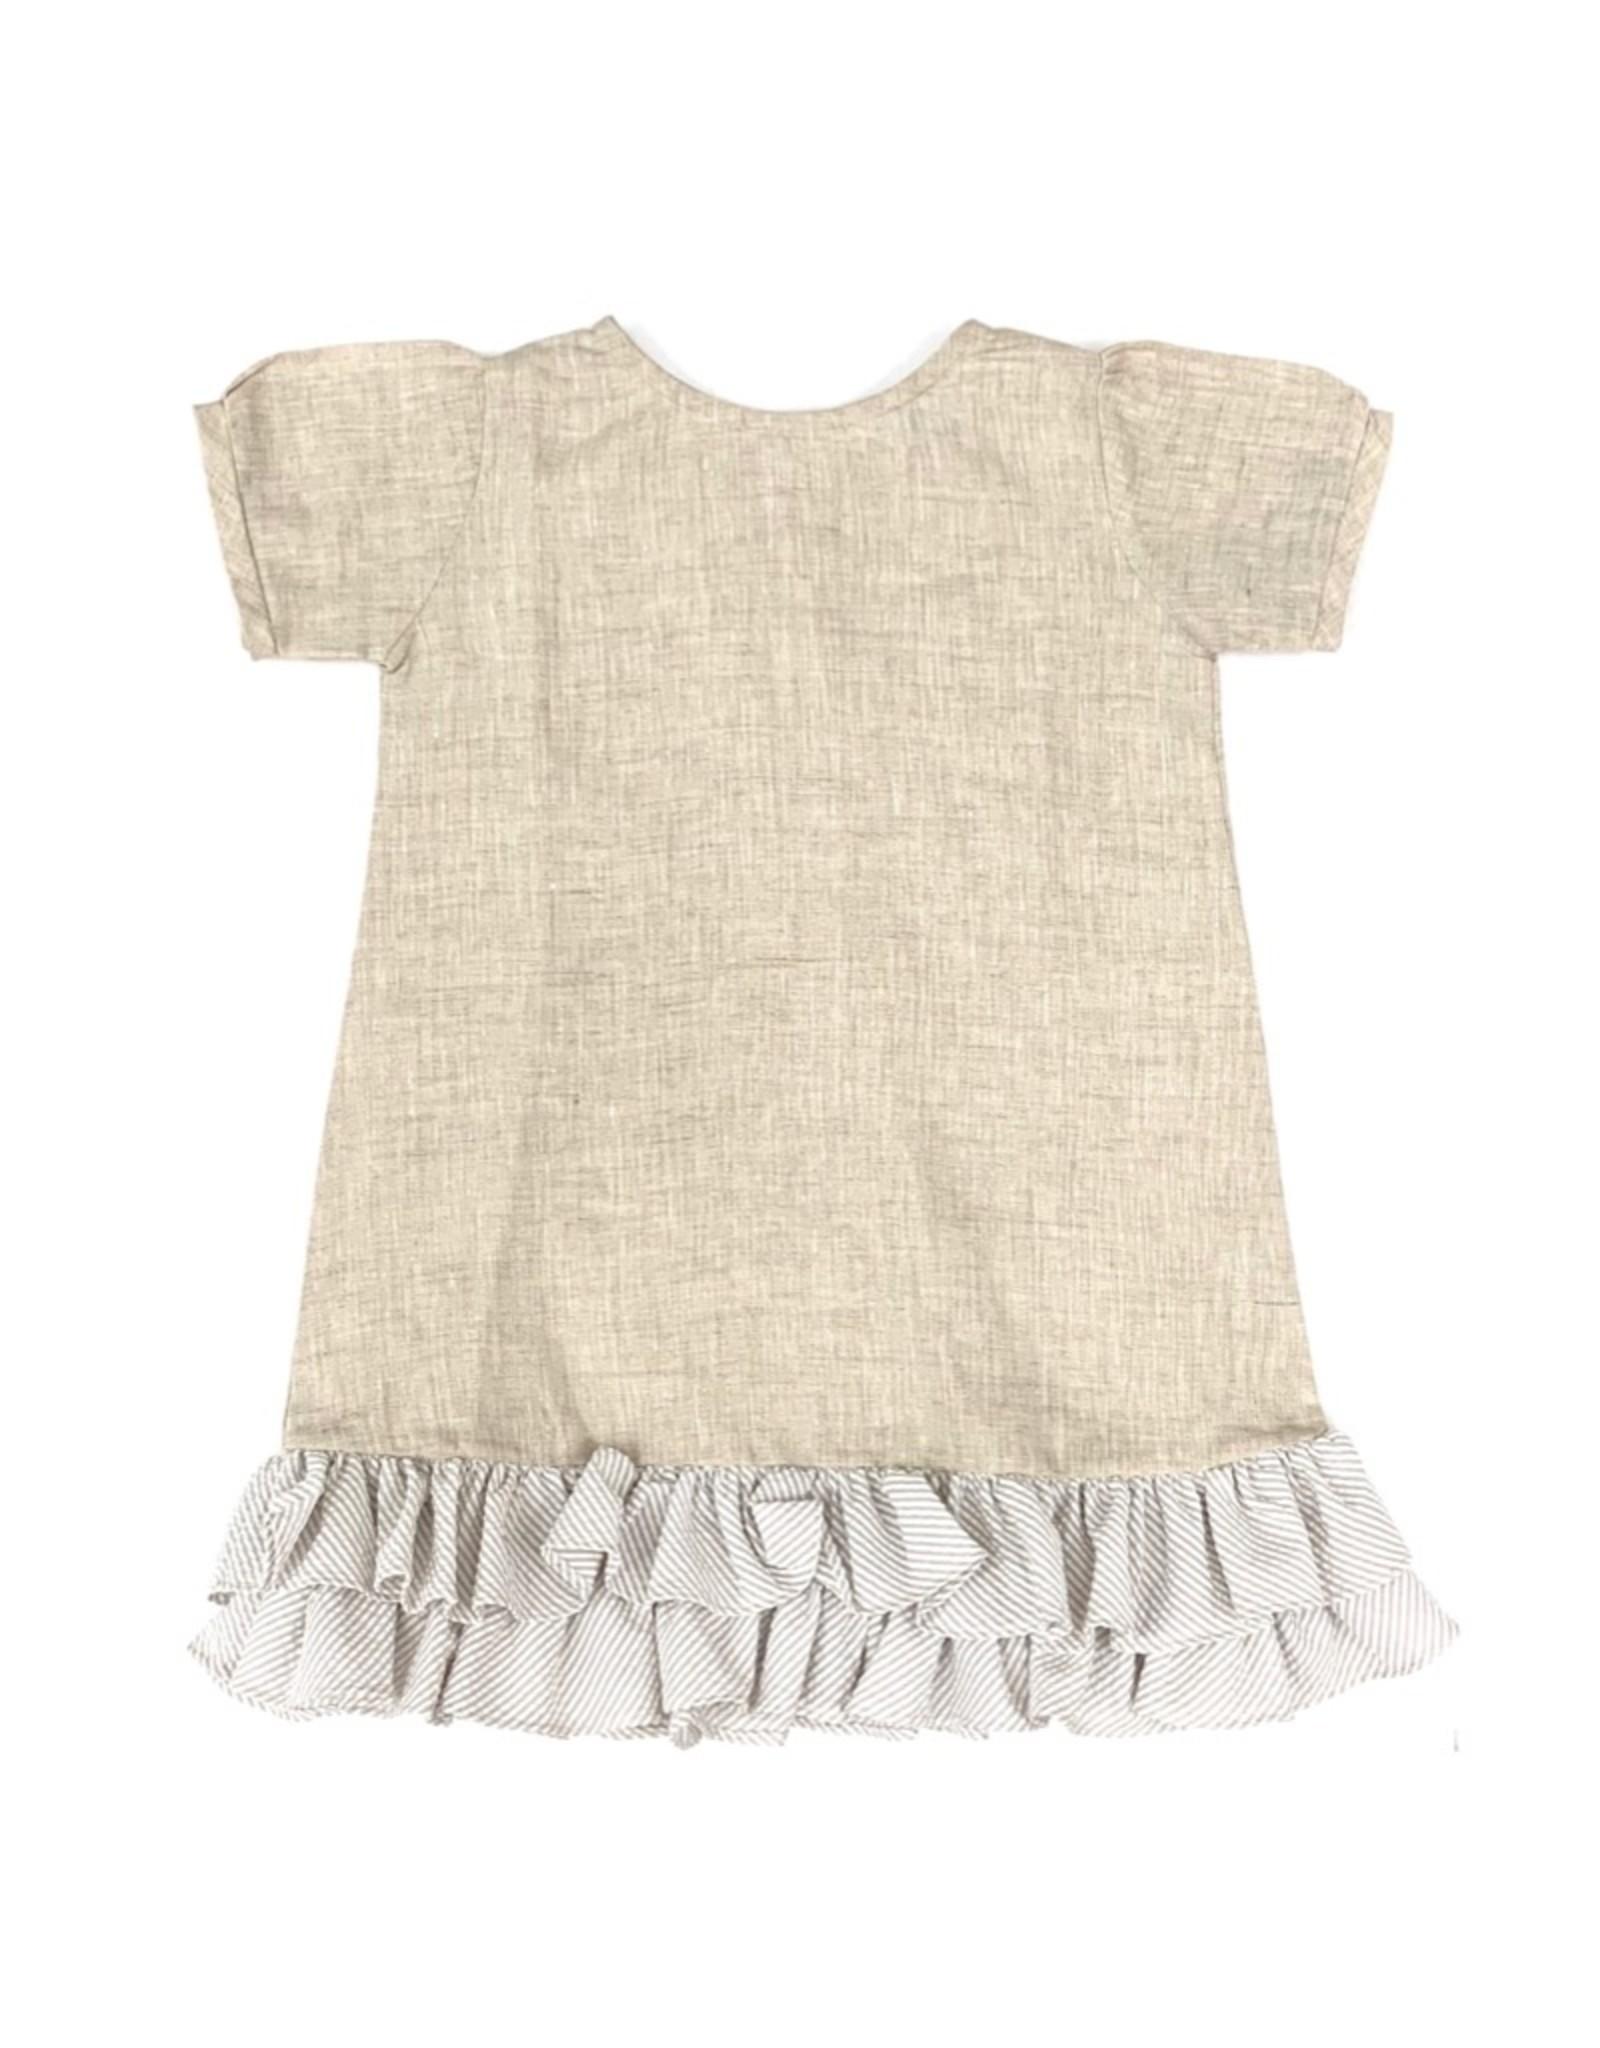 Baliene Giselle Girls Dress Oatmeal With Stripes